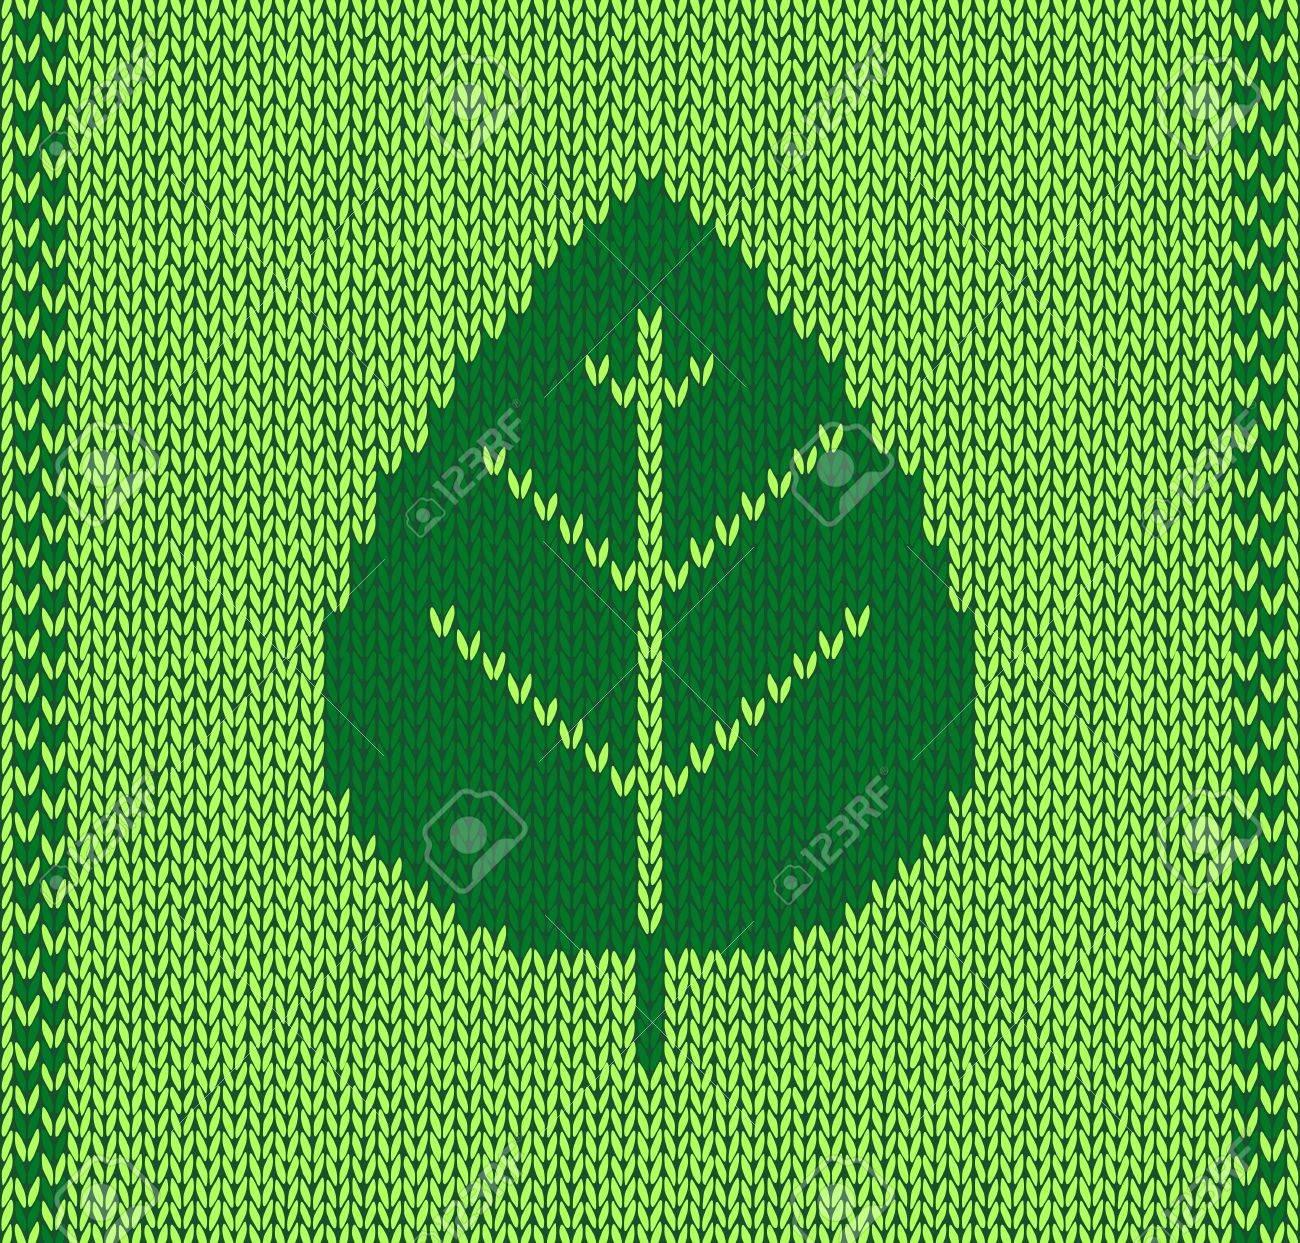 Luxury Strickmuster Blatt Gift - Decke Stricken Muster ...